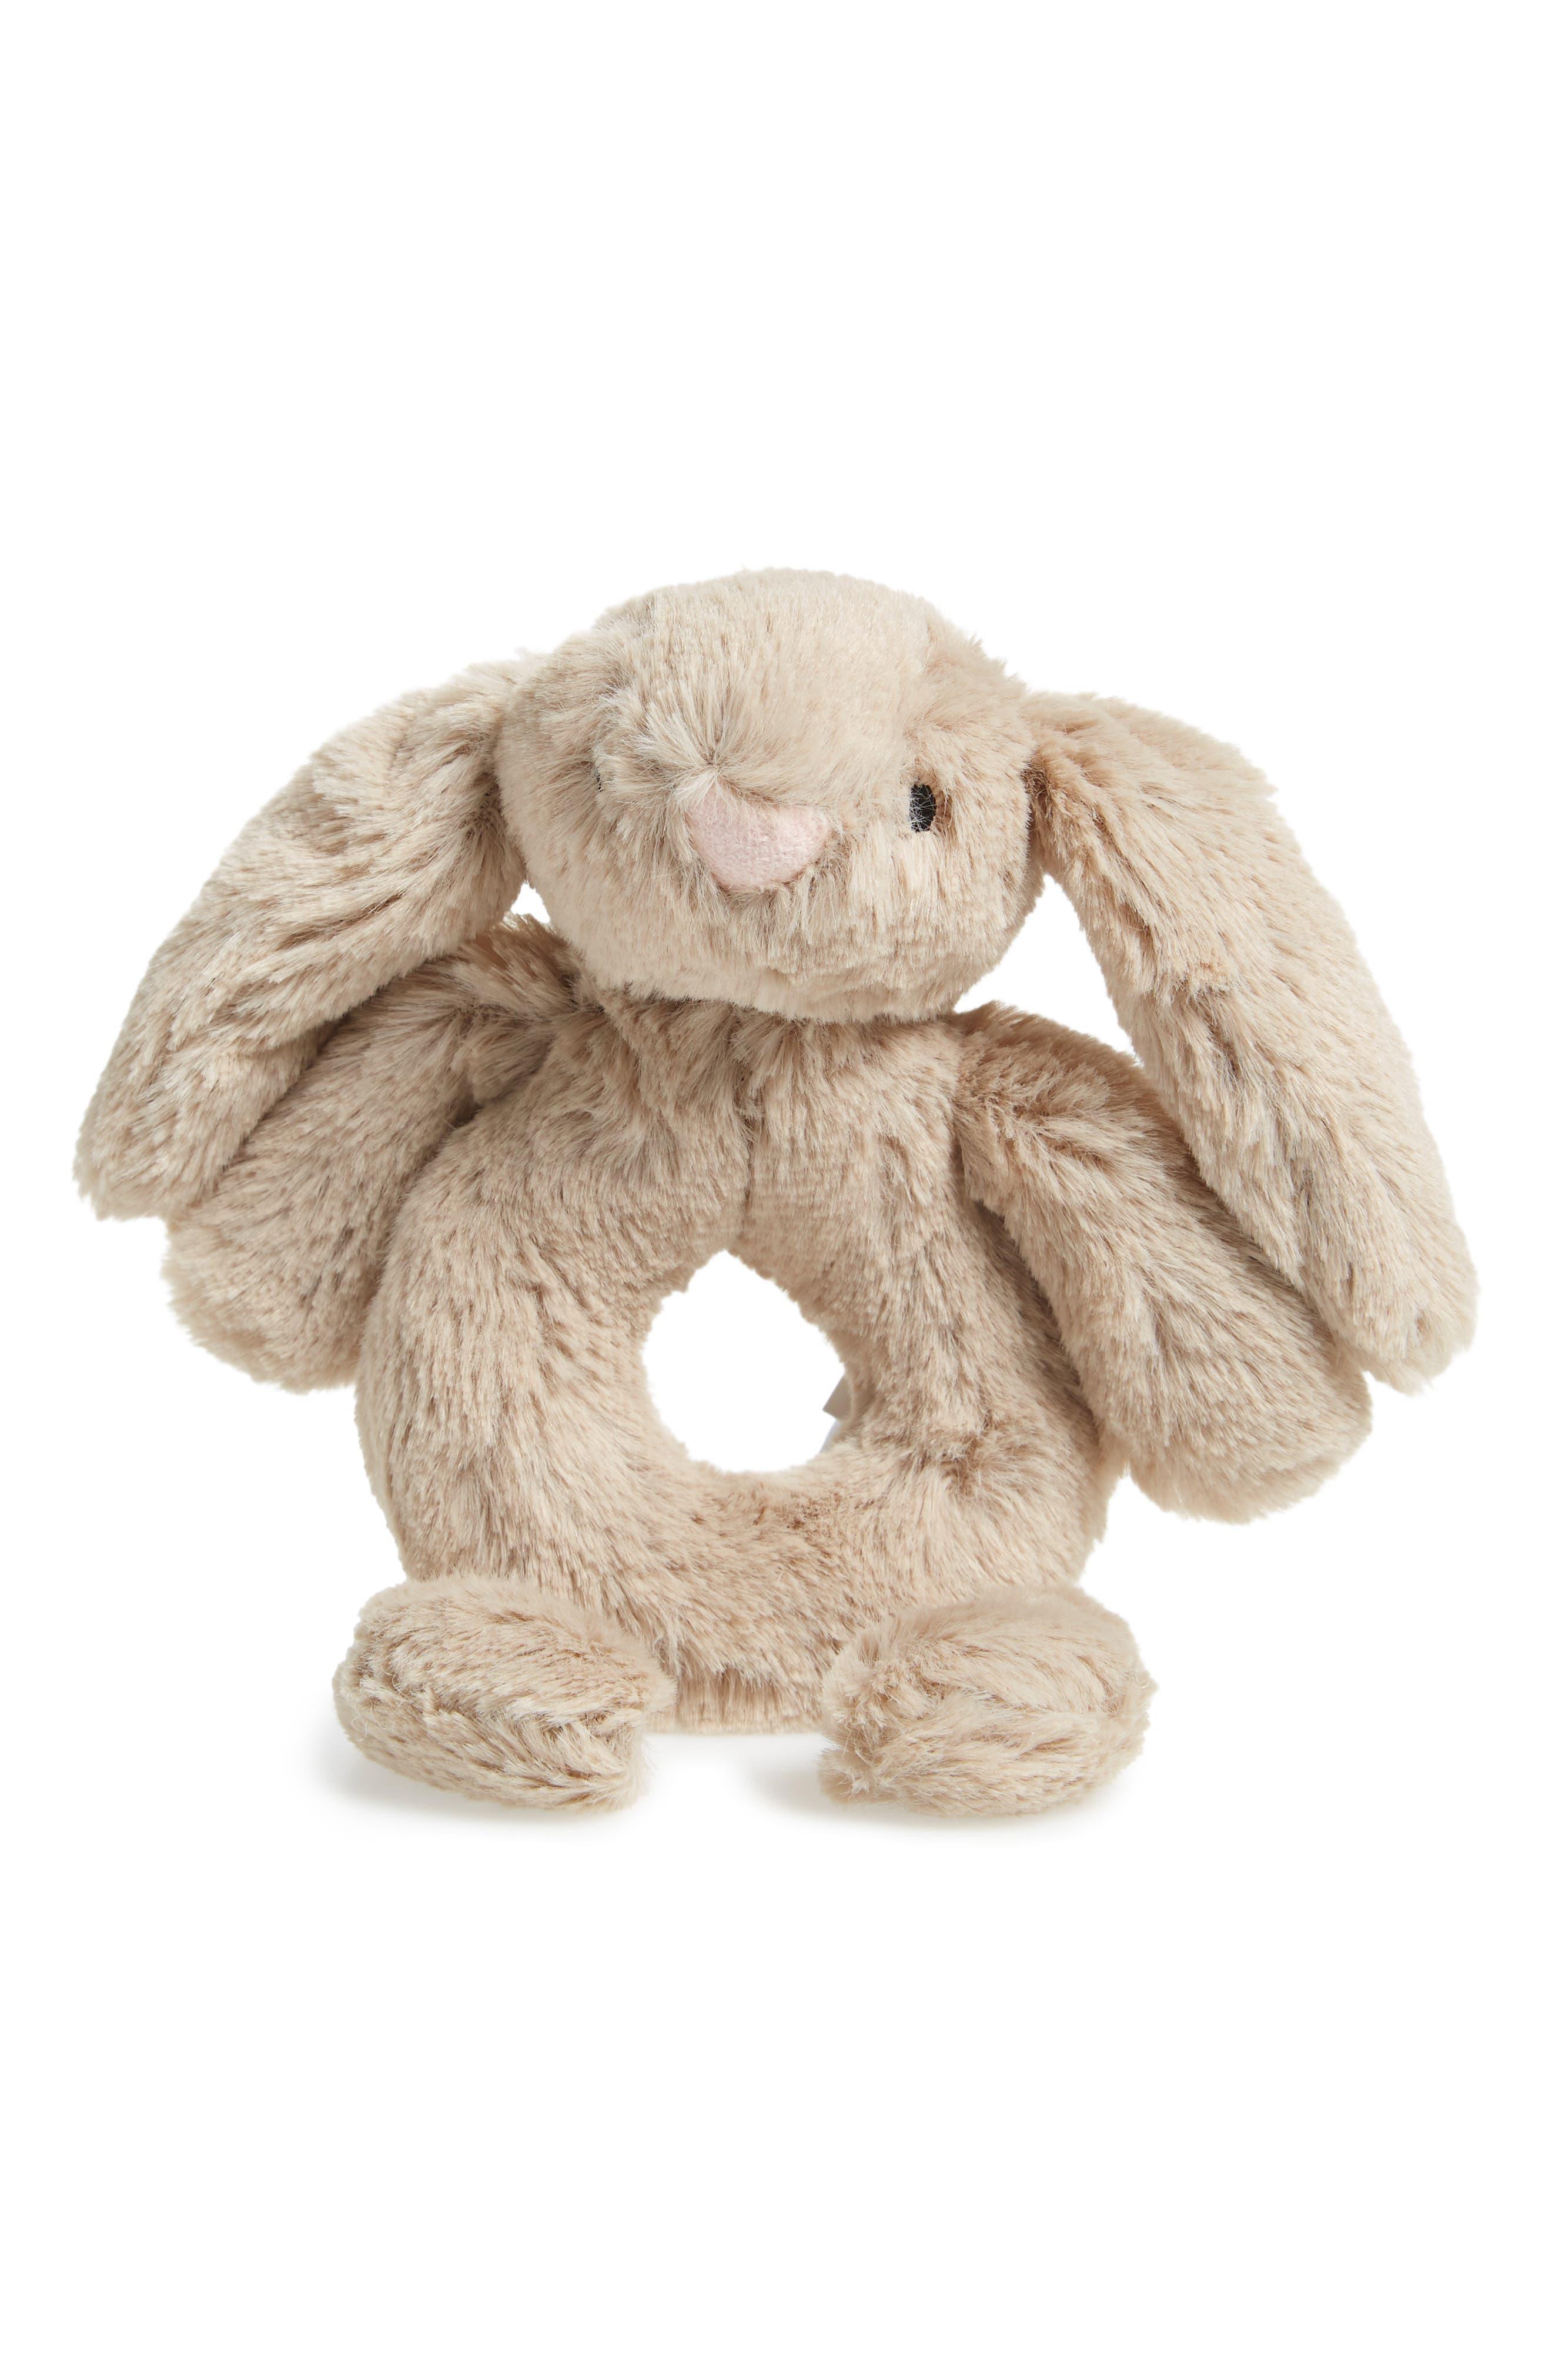 'Bashful Bunny' Grabber Rattle,                             Alternate thumbnail 2, color,                             BEIGE